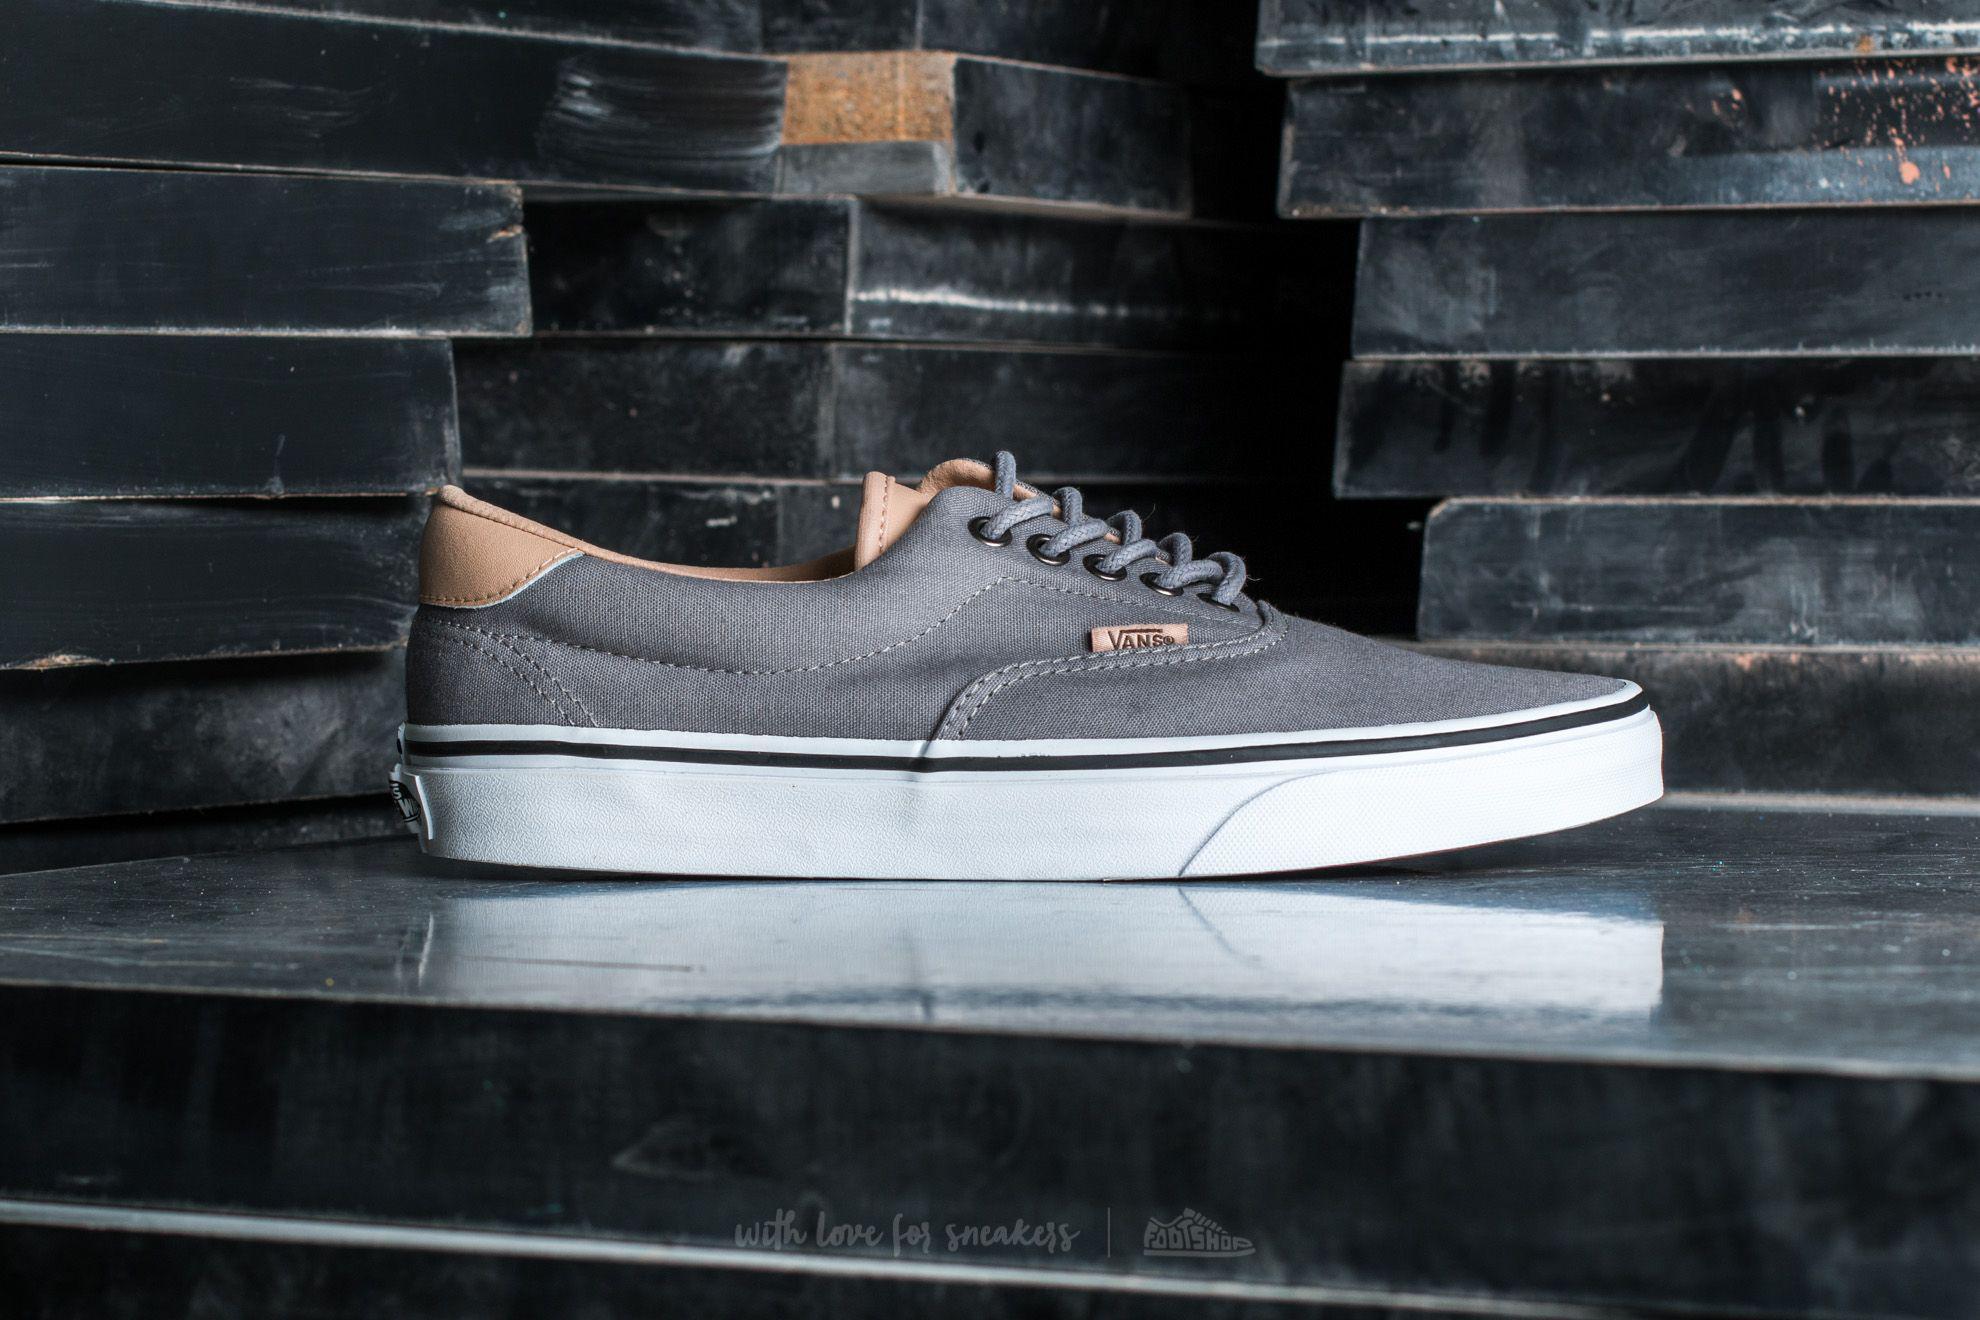 Lyst - Vans Era 59 (veggie Tan) Frost Grey  True White in Gray for Men 83f16099ab